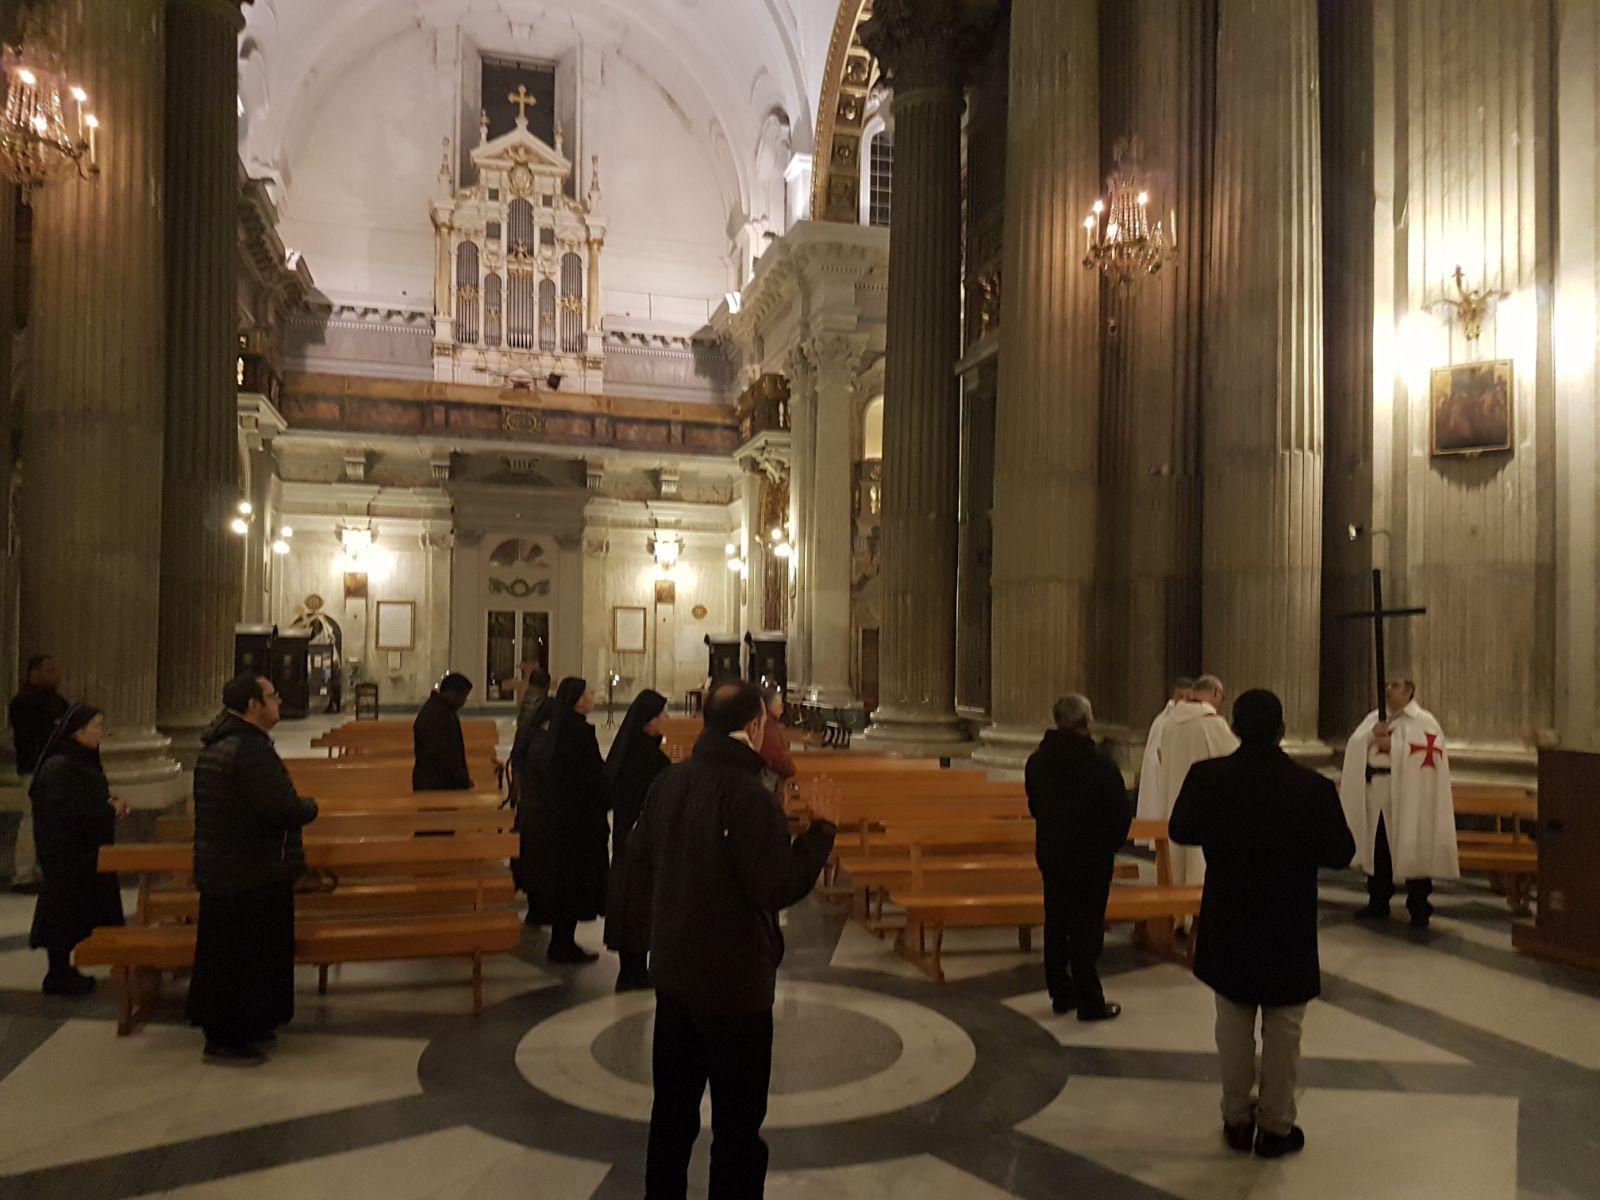 16feb2018 - Basilica di Santa Maria in Portico in Campitelli - Via Crucis - Templari Cattolici - foto 5